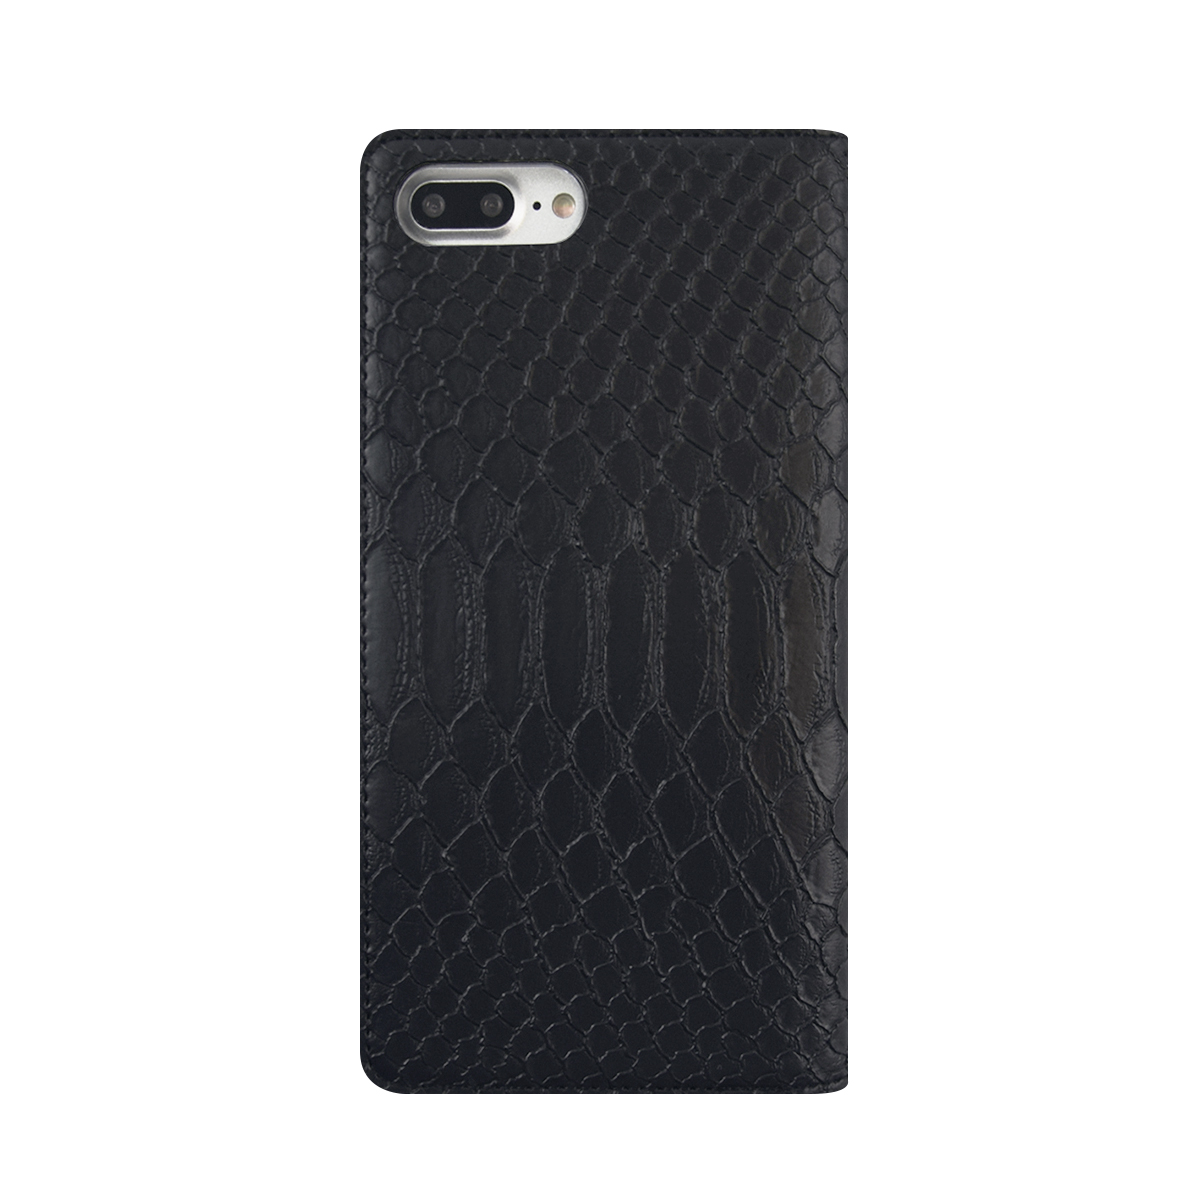 iPhone 8 Plus / 7 Plus ケース 手帳型 Gaze Matt Python Diary (ゲイズ マットパイソンダイアリー)アイフォン カバー